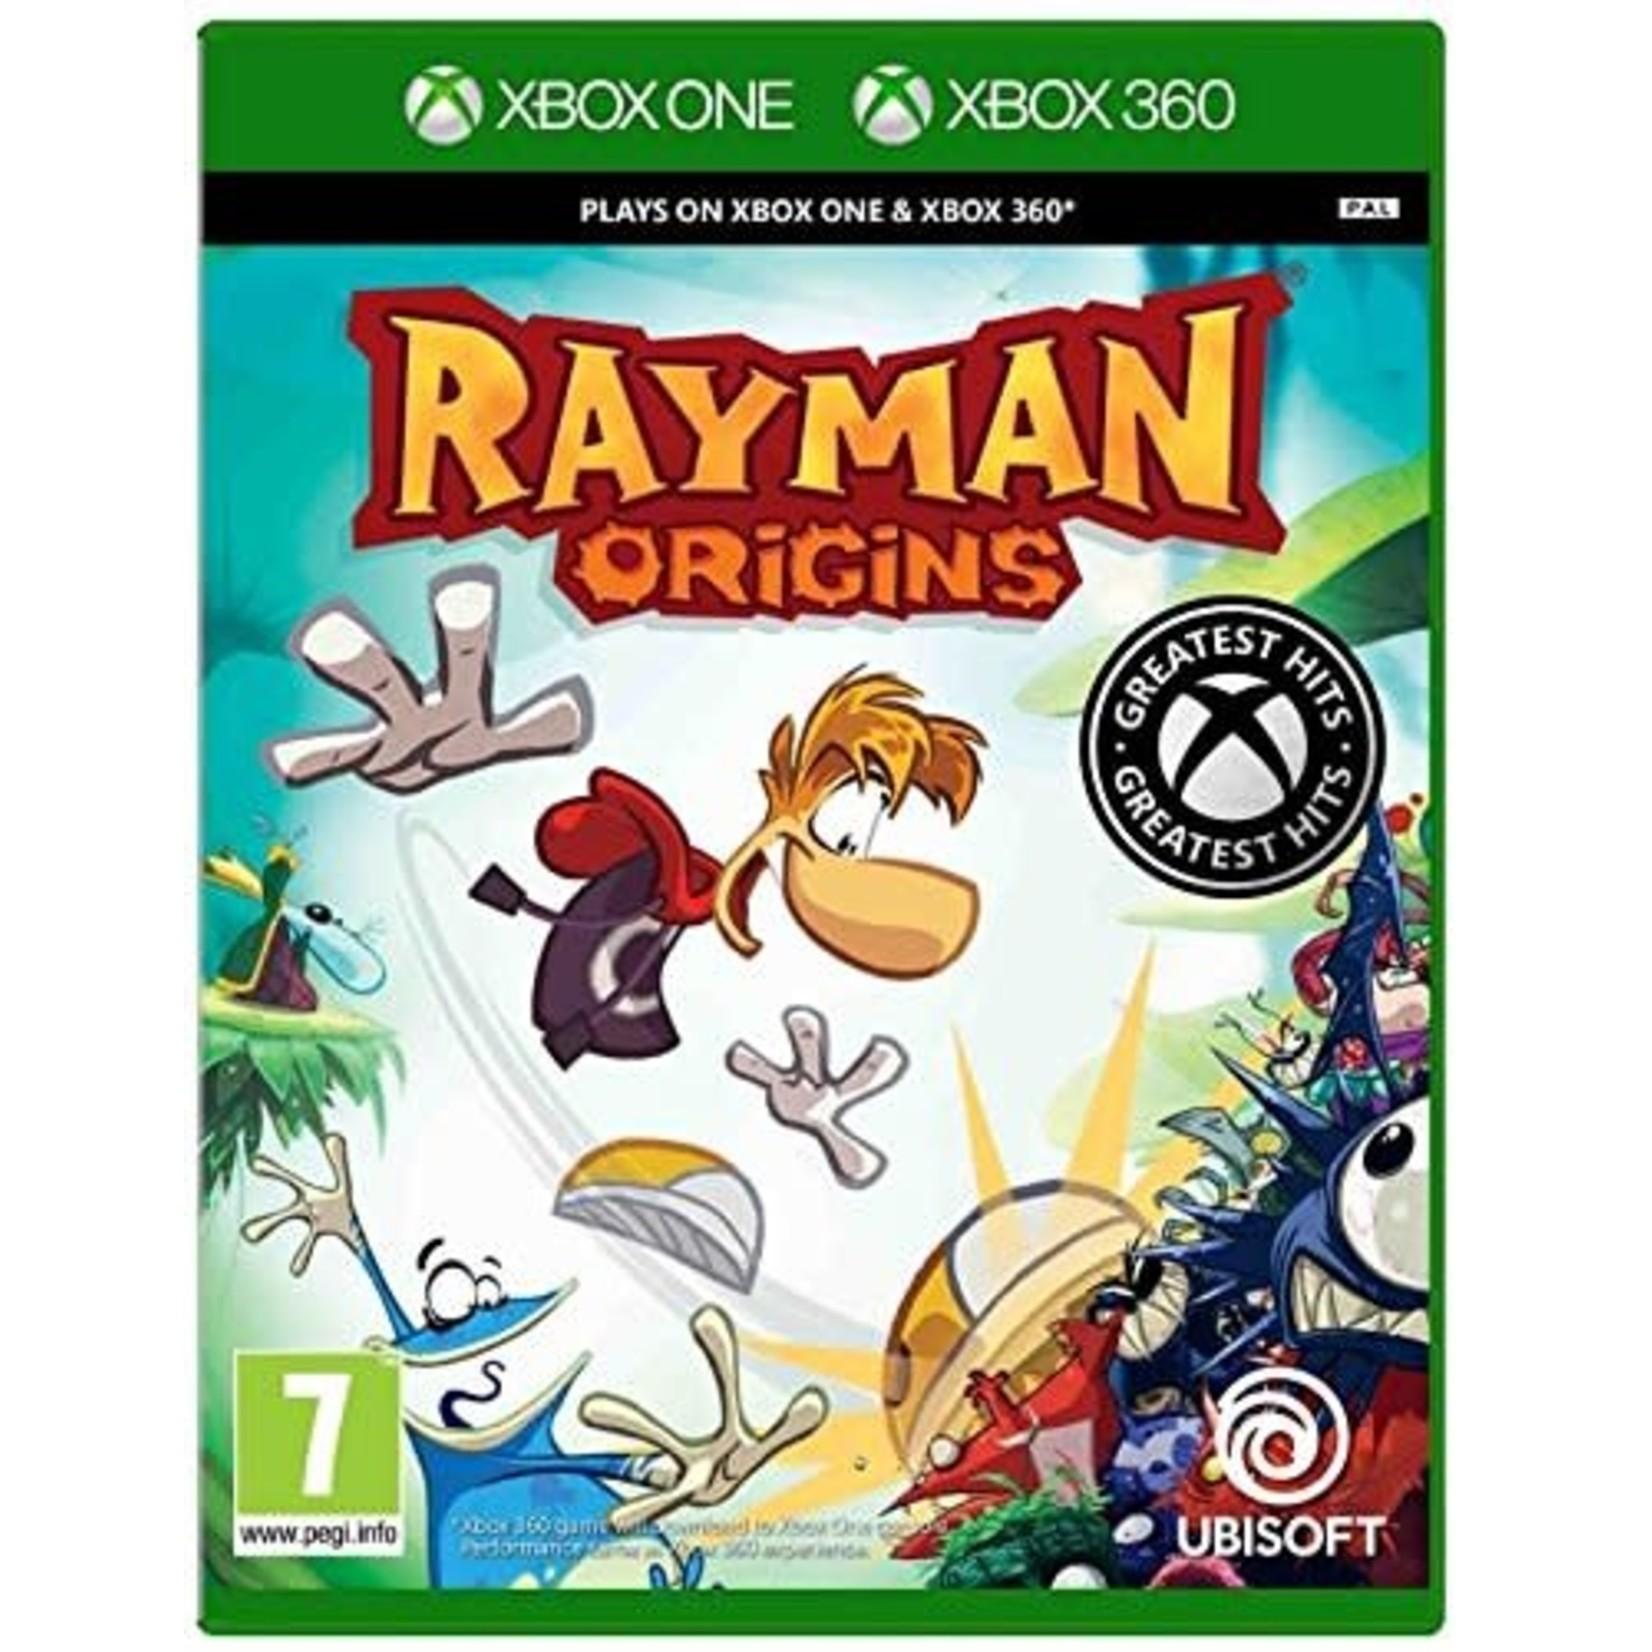 XB1-Rayman Origins